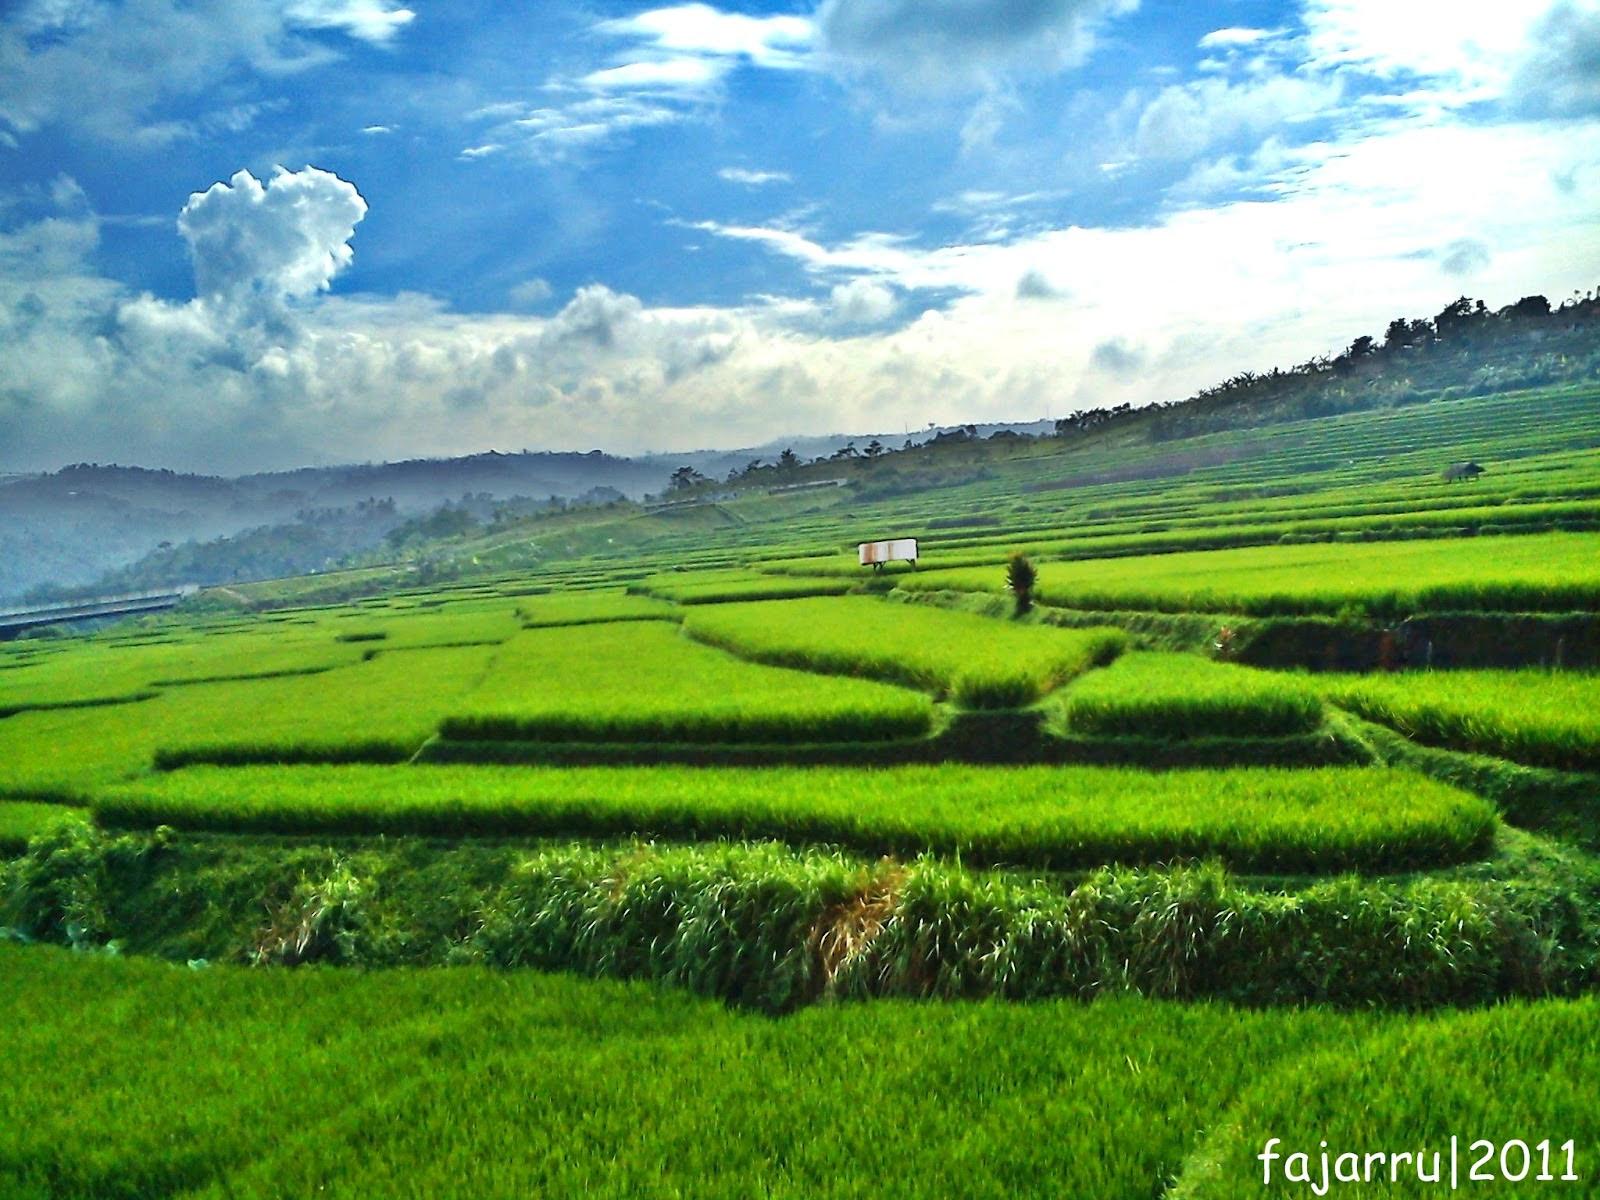 Gambar Gambar Pemandangan Sawah Blogger Jawa